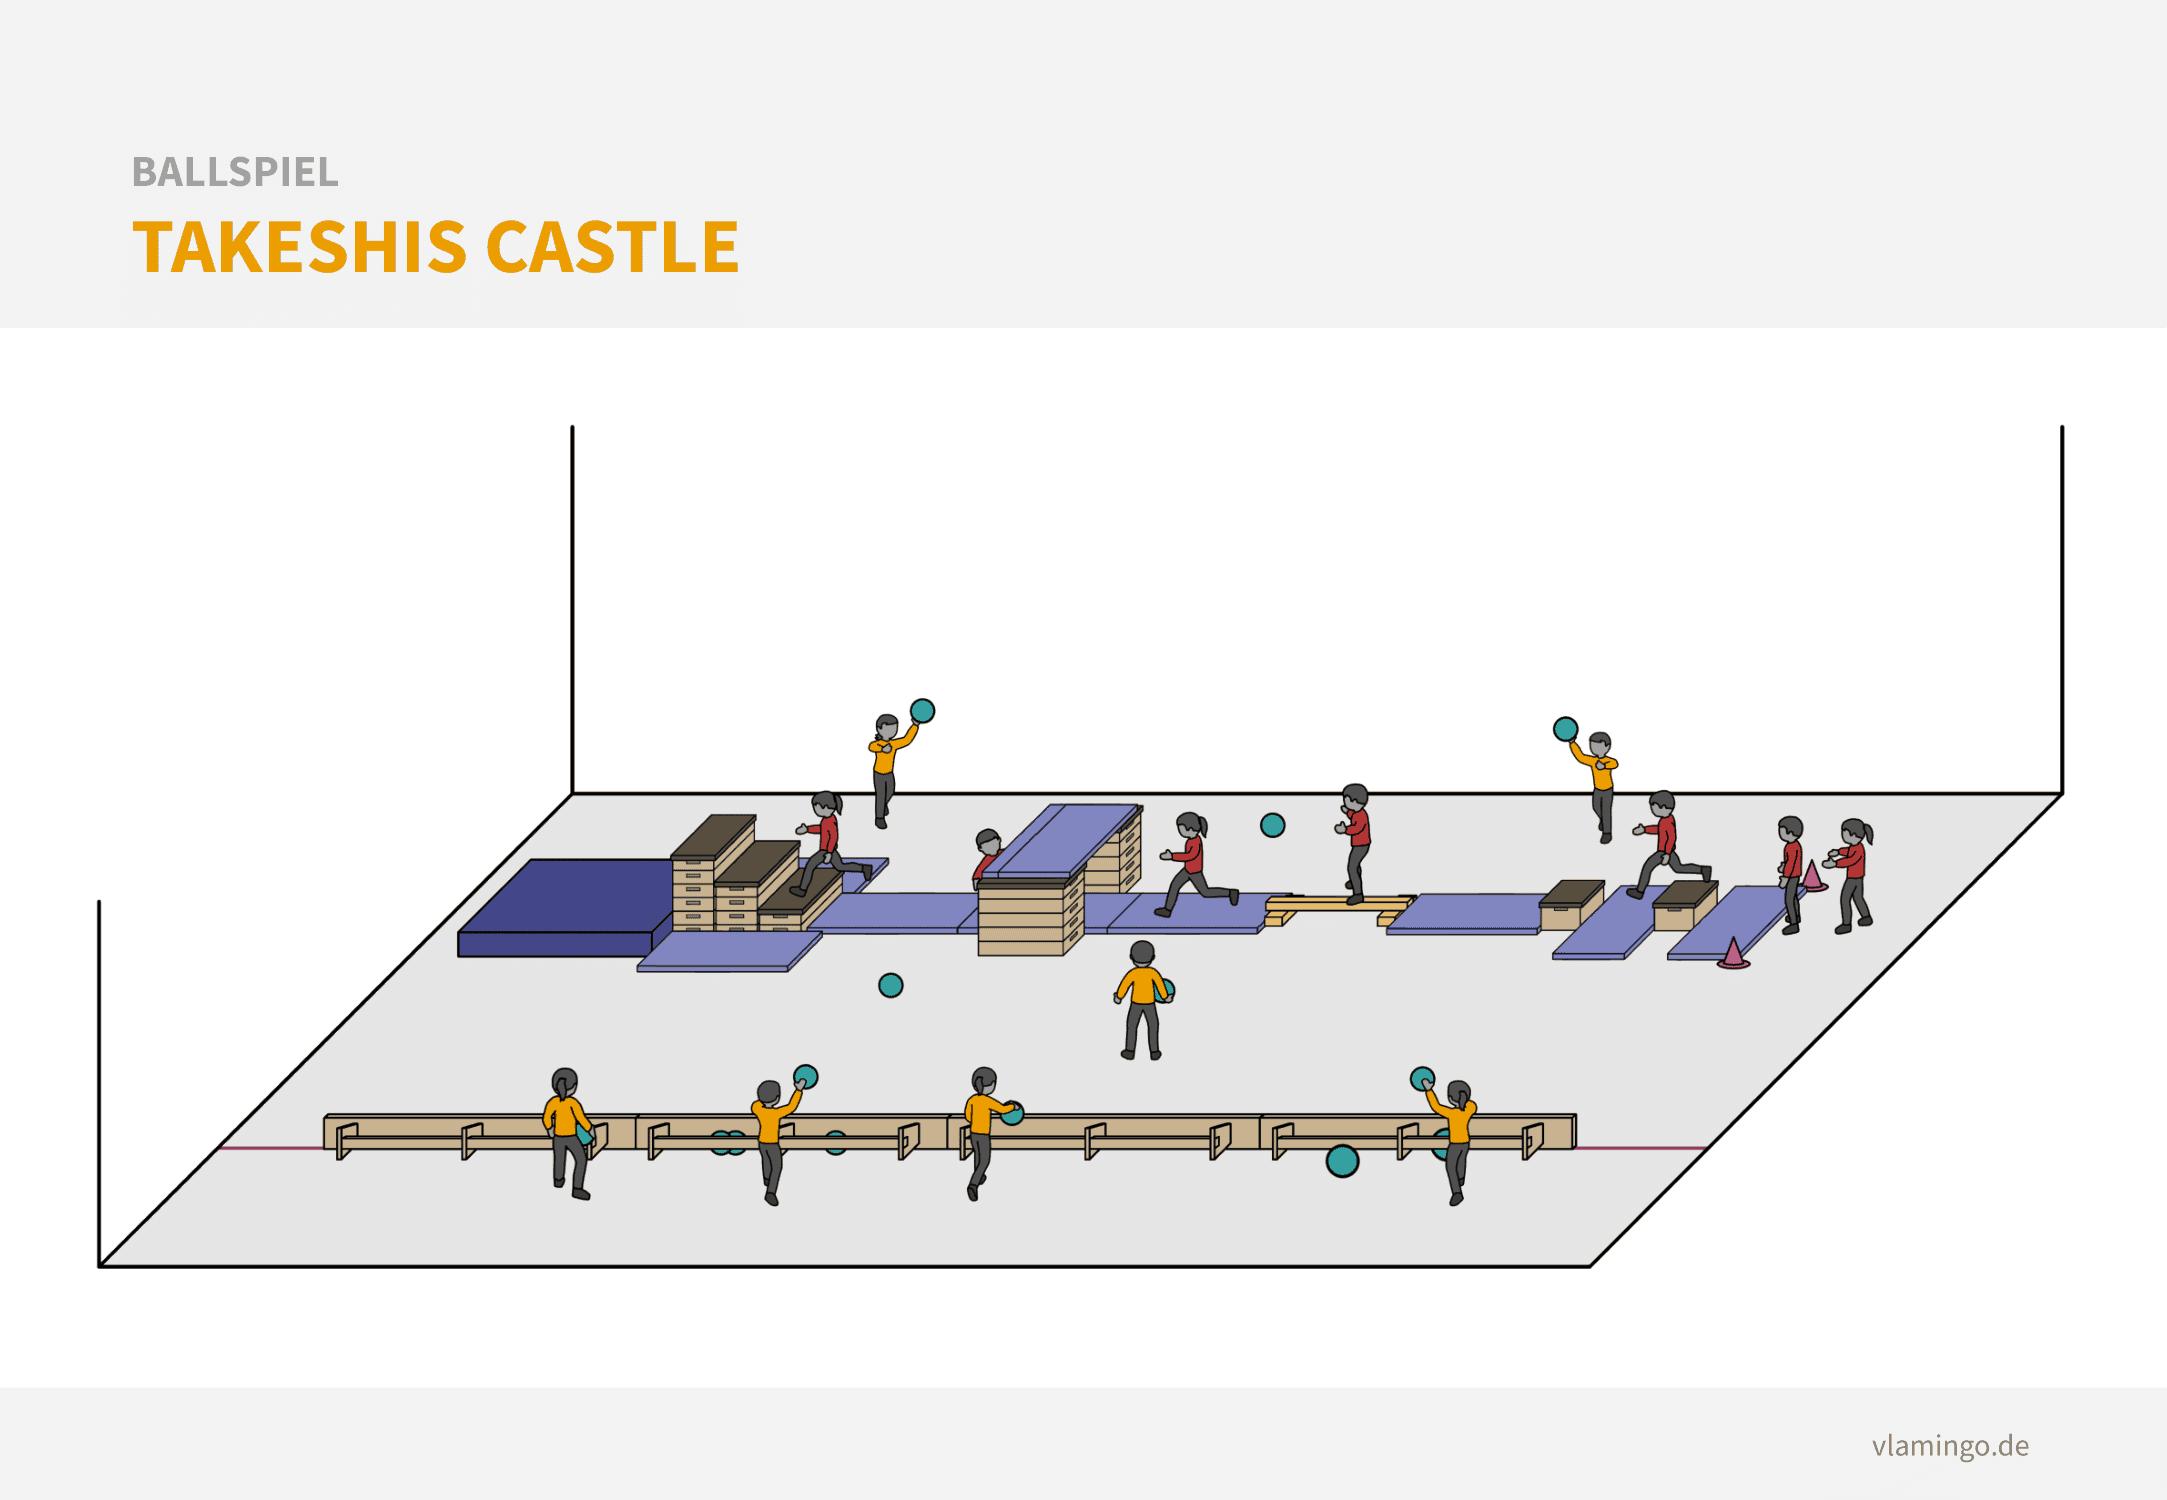 Ballspiel: Takeshis Castle